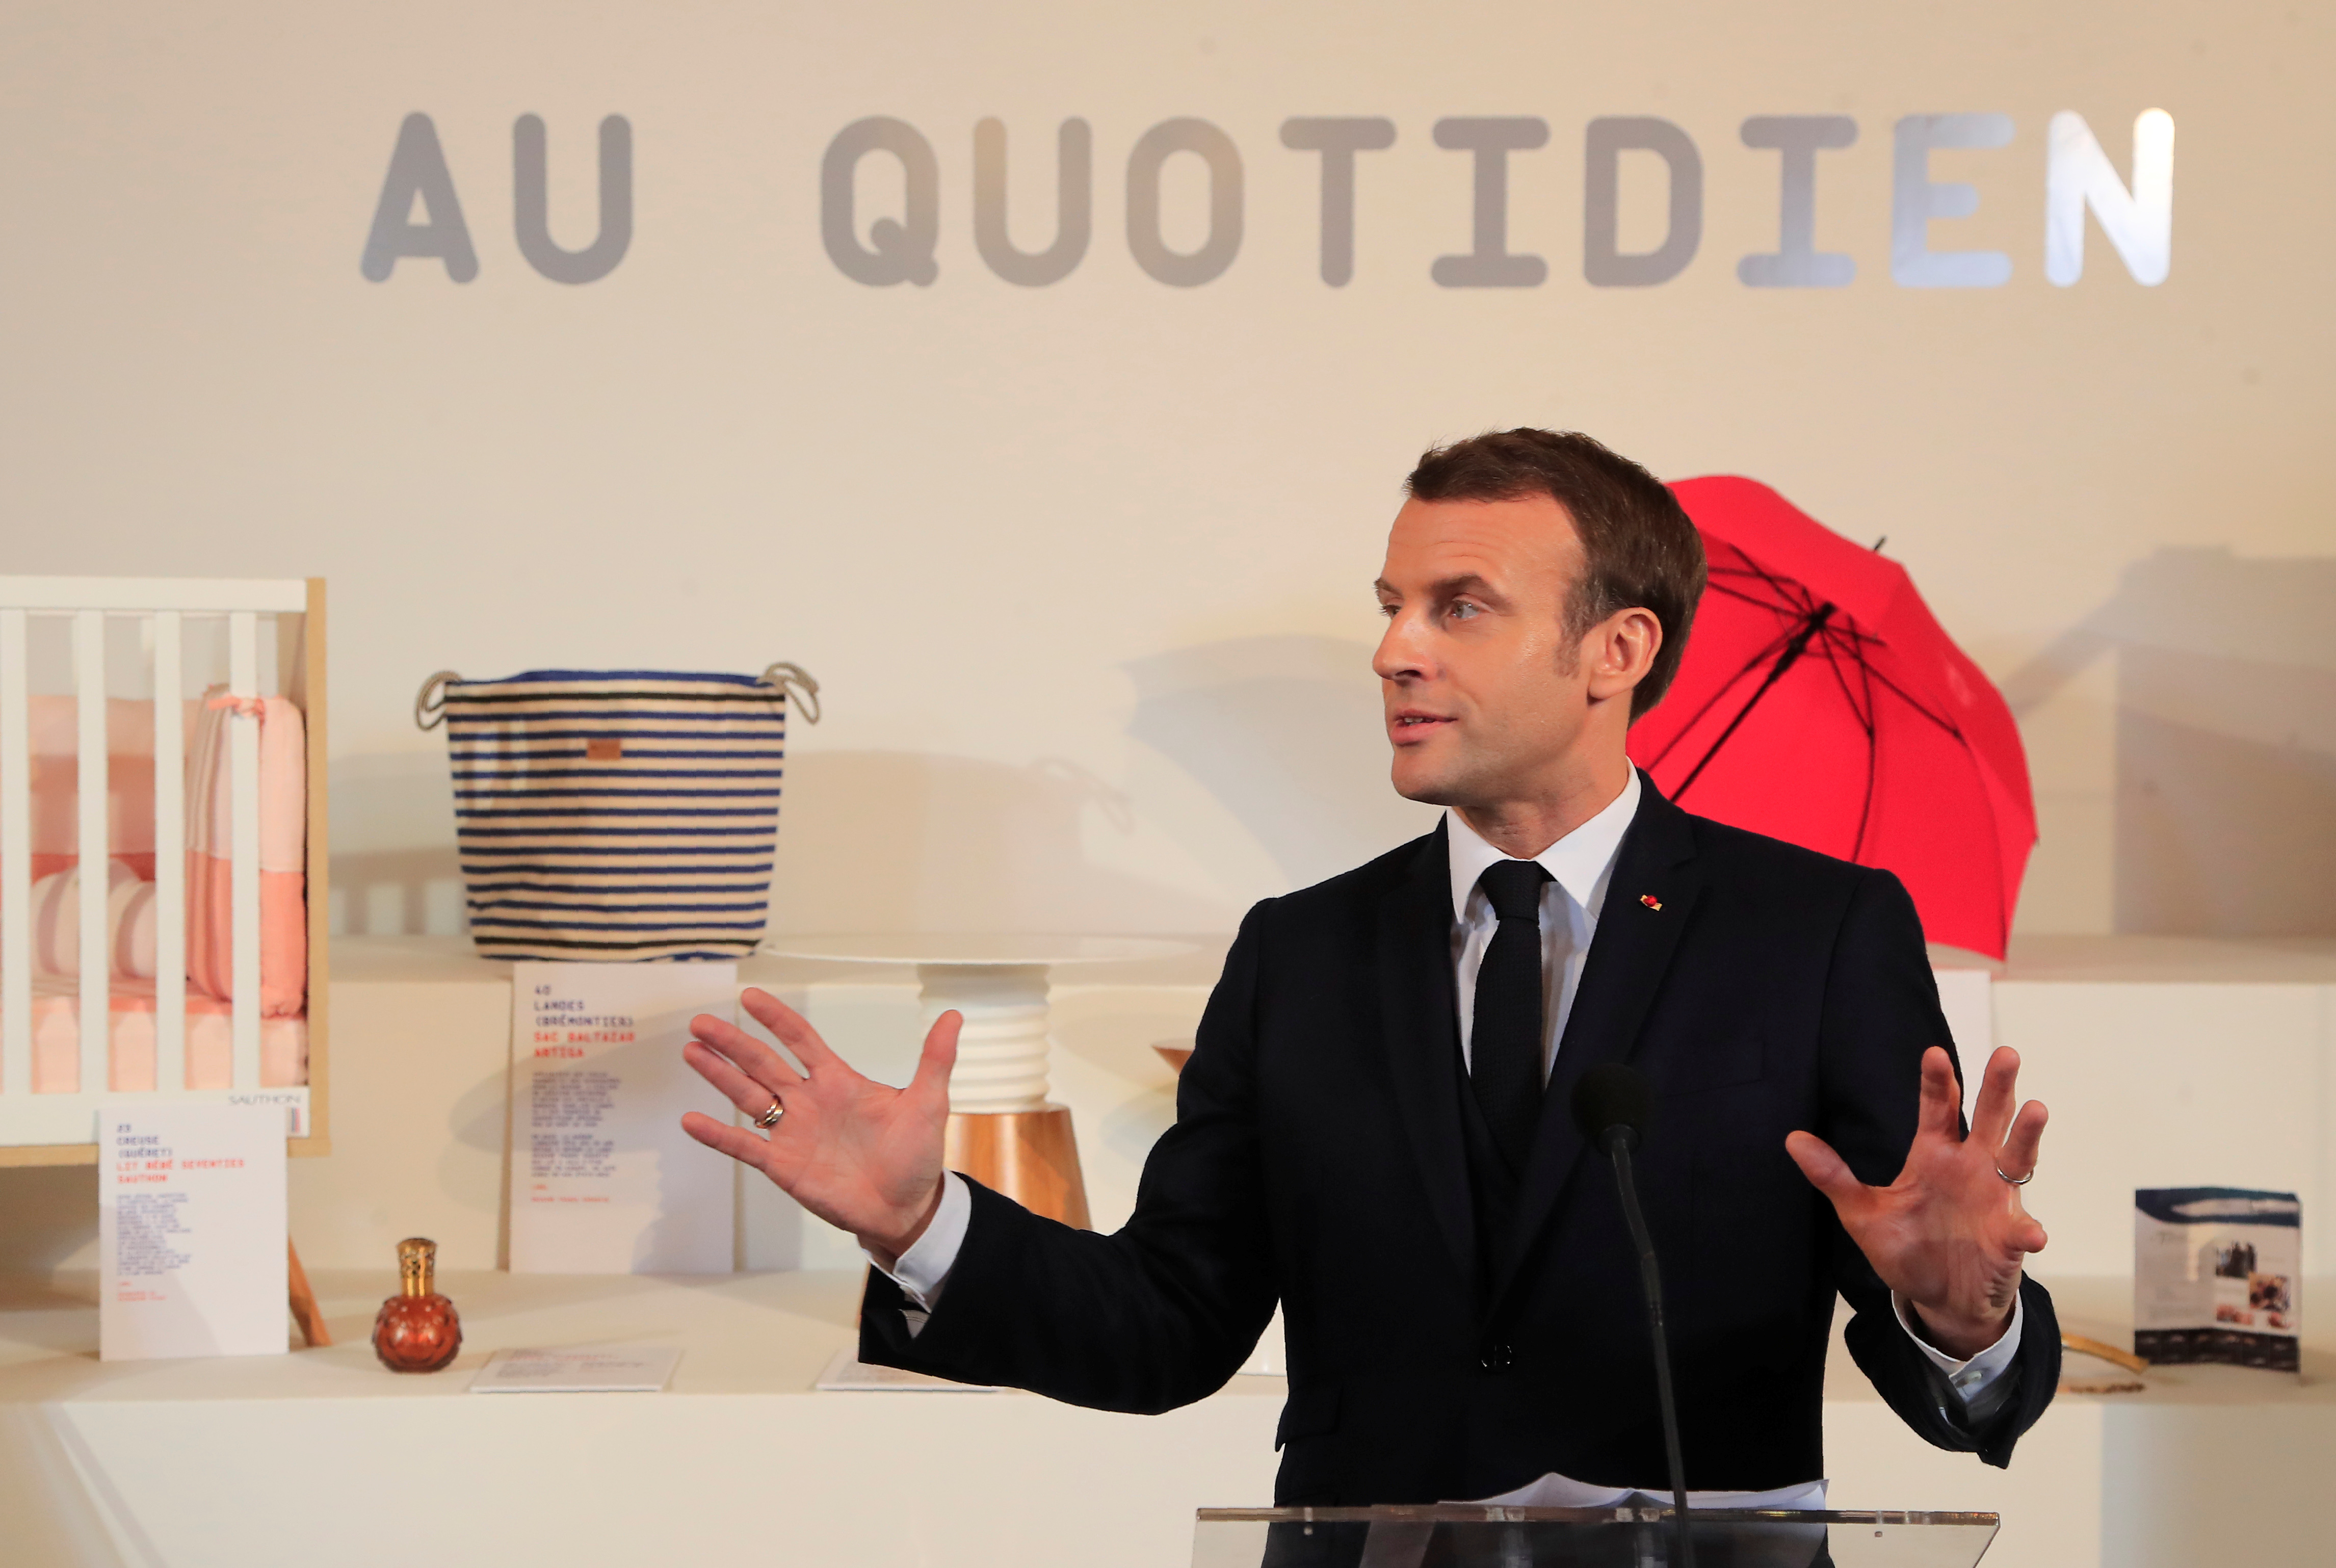 AUKUS – Γαλλία: Στήριξη στον Μακρόν απέναντι στις ΗΠΑ από τους υπουργούς εξωτερικών της Ε.Ε